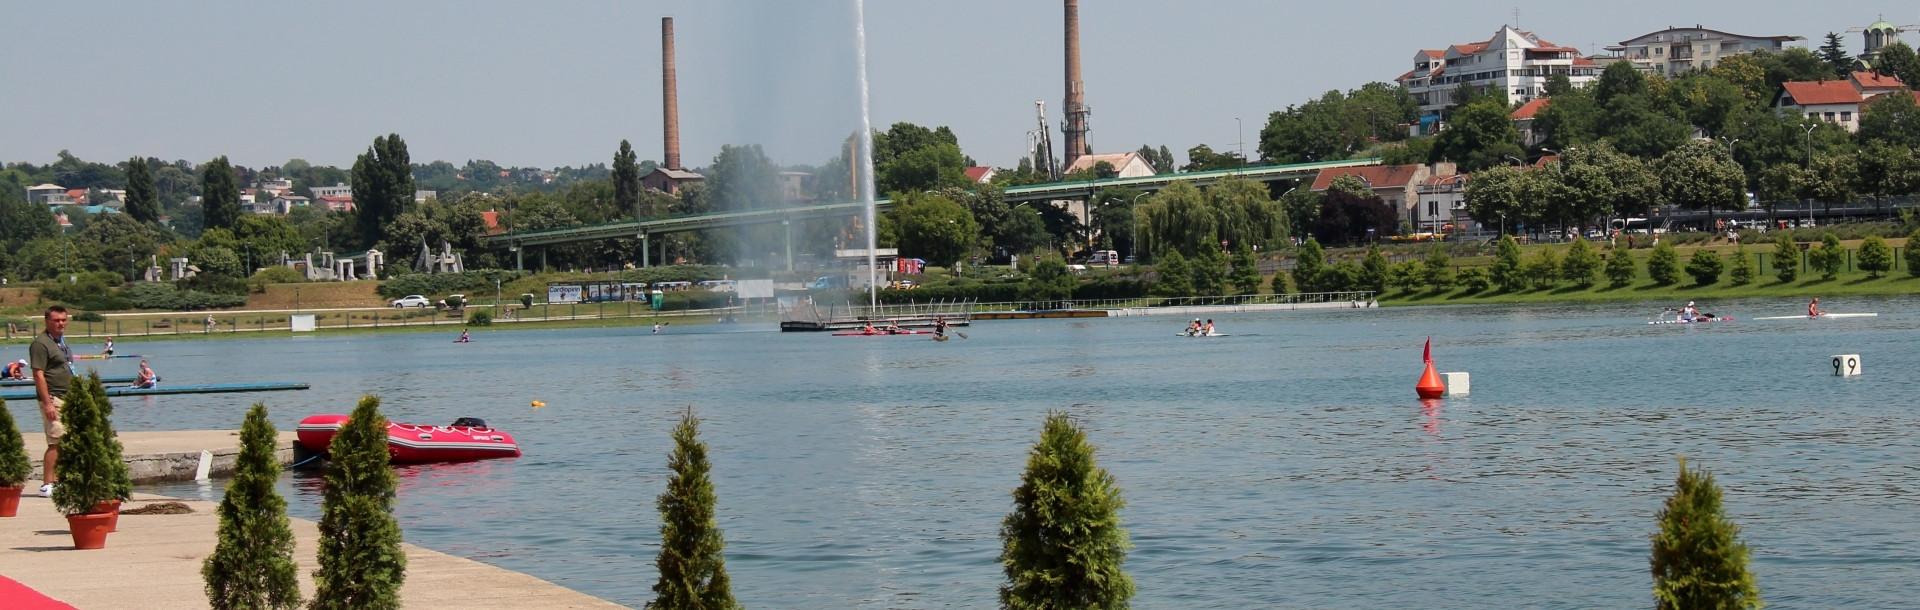 Belgrade prepares to host Canoe Sprint and Paracanoe European Championships